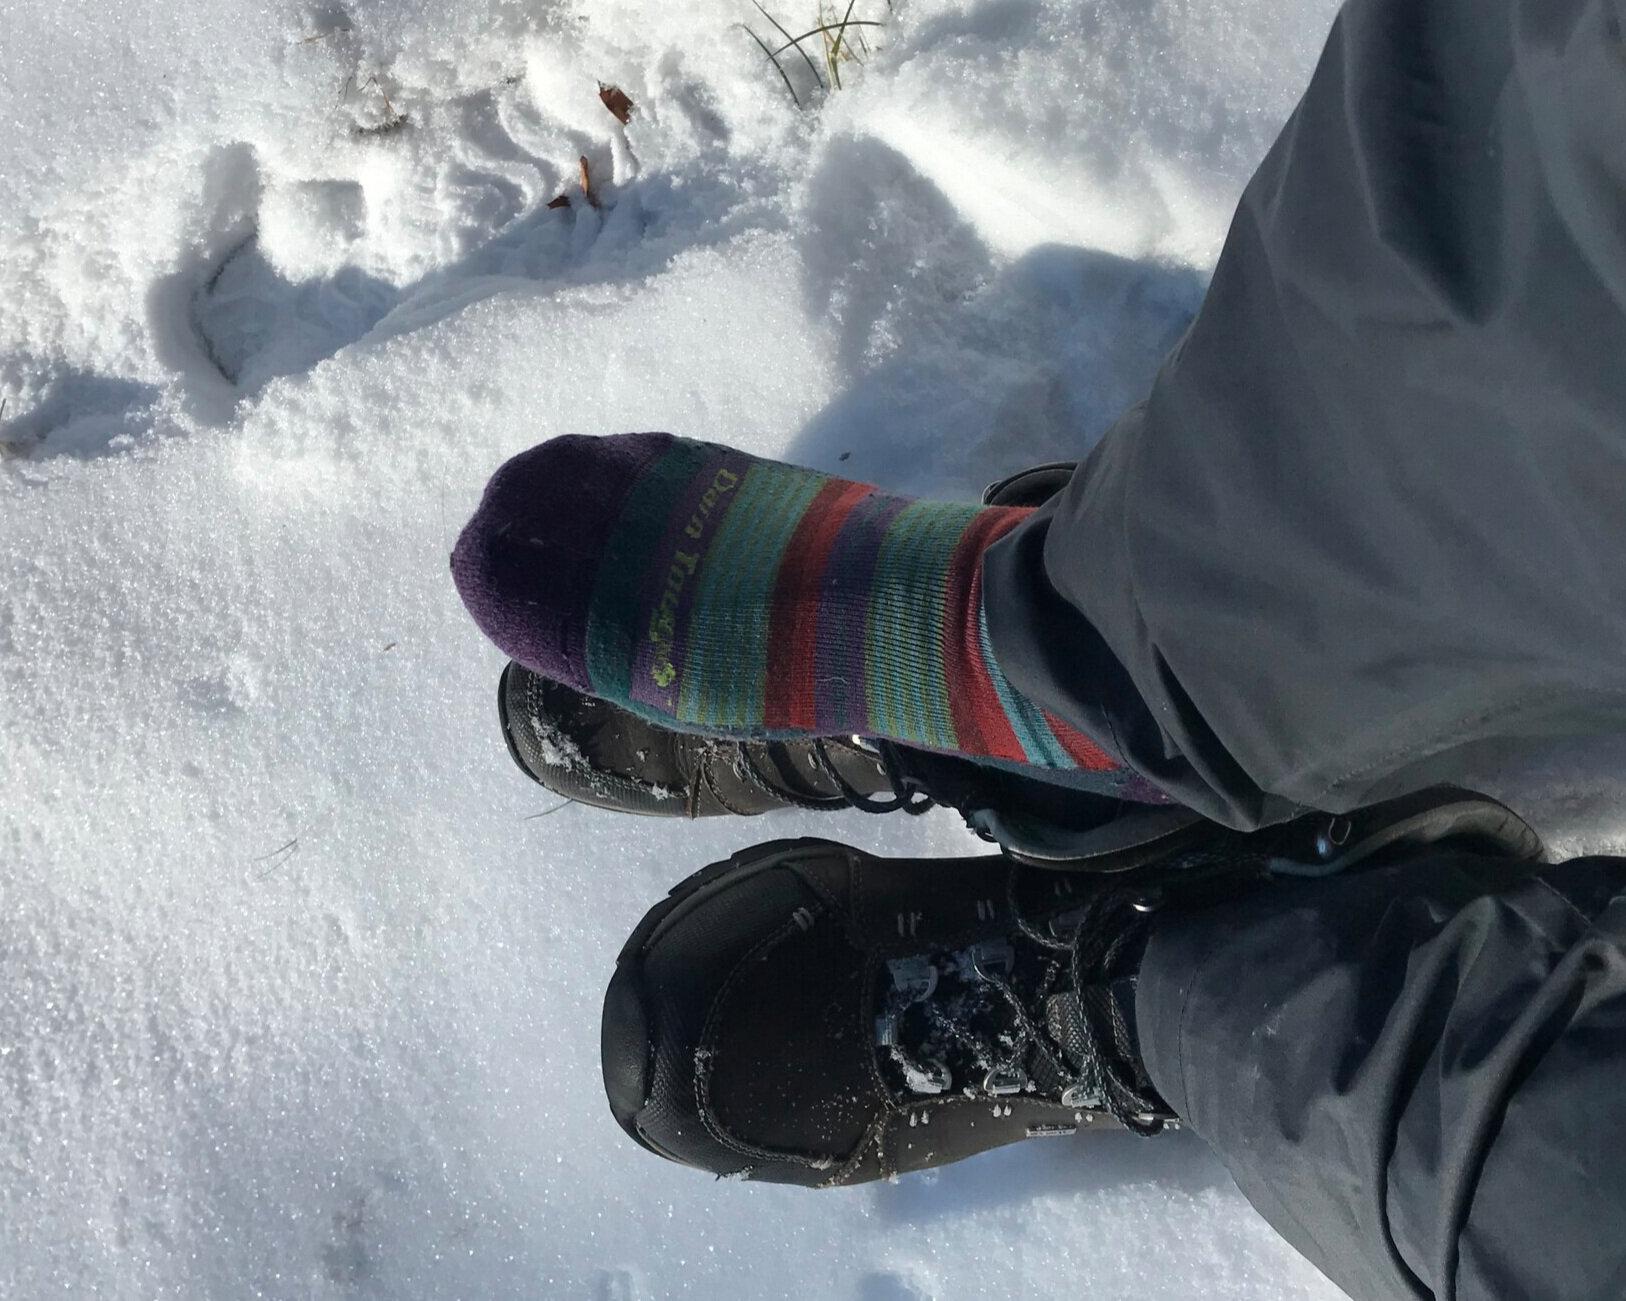 Darn Tough Merino Wool socks paired with waterproof boots